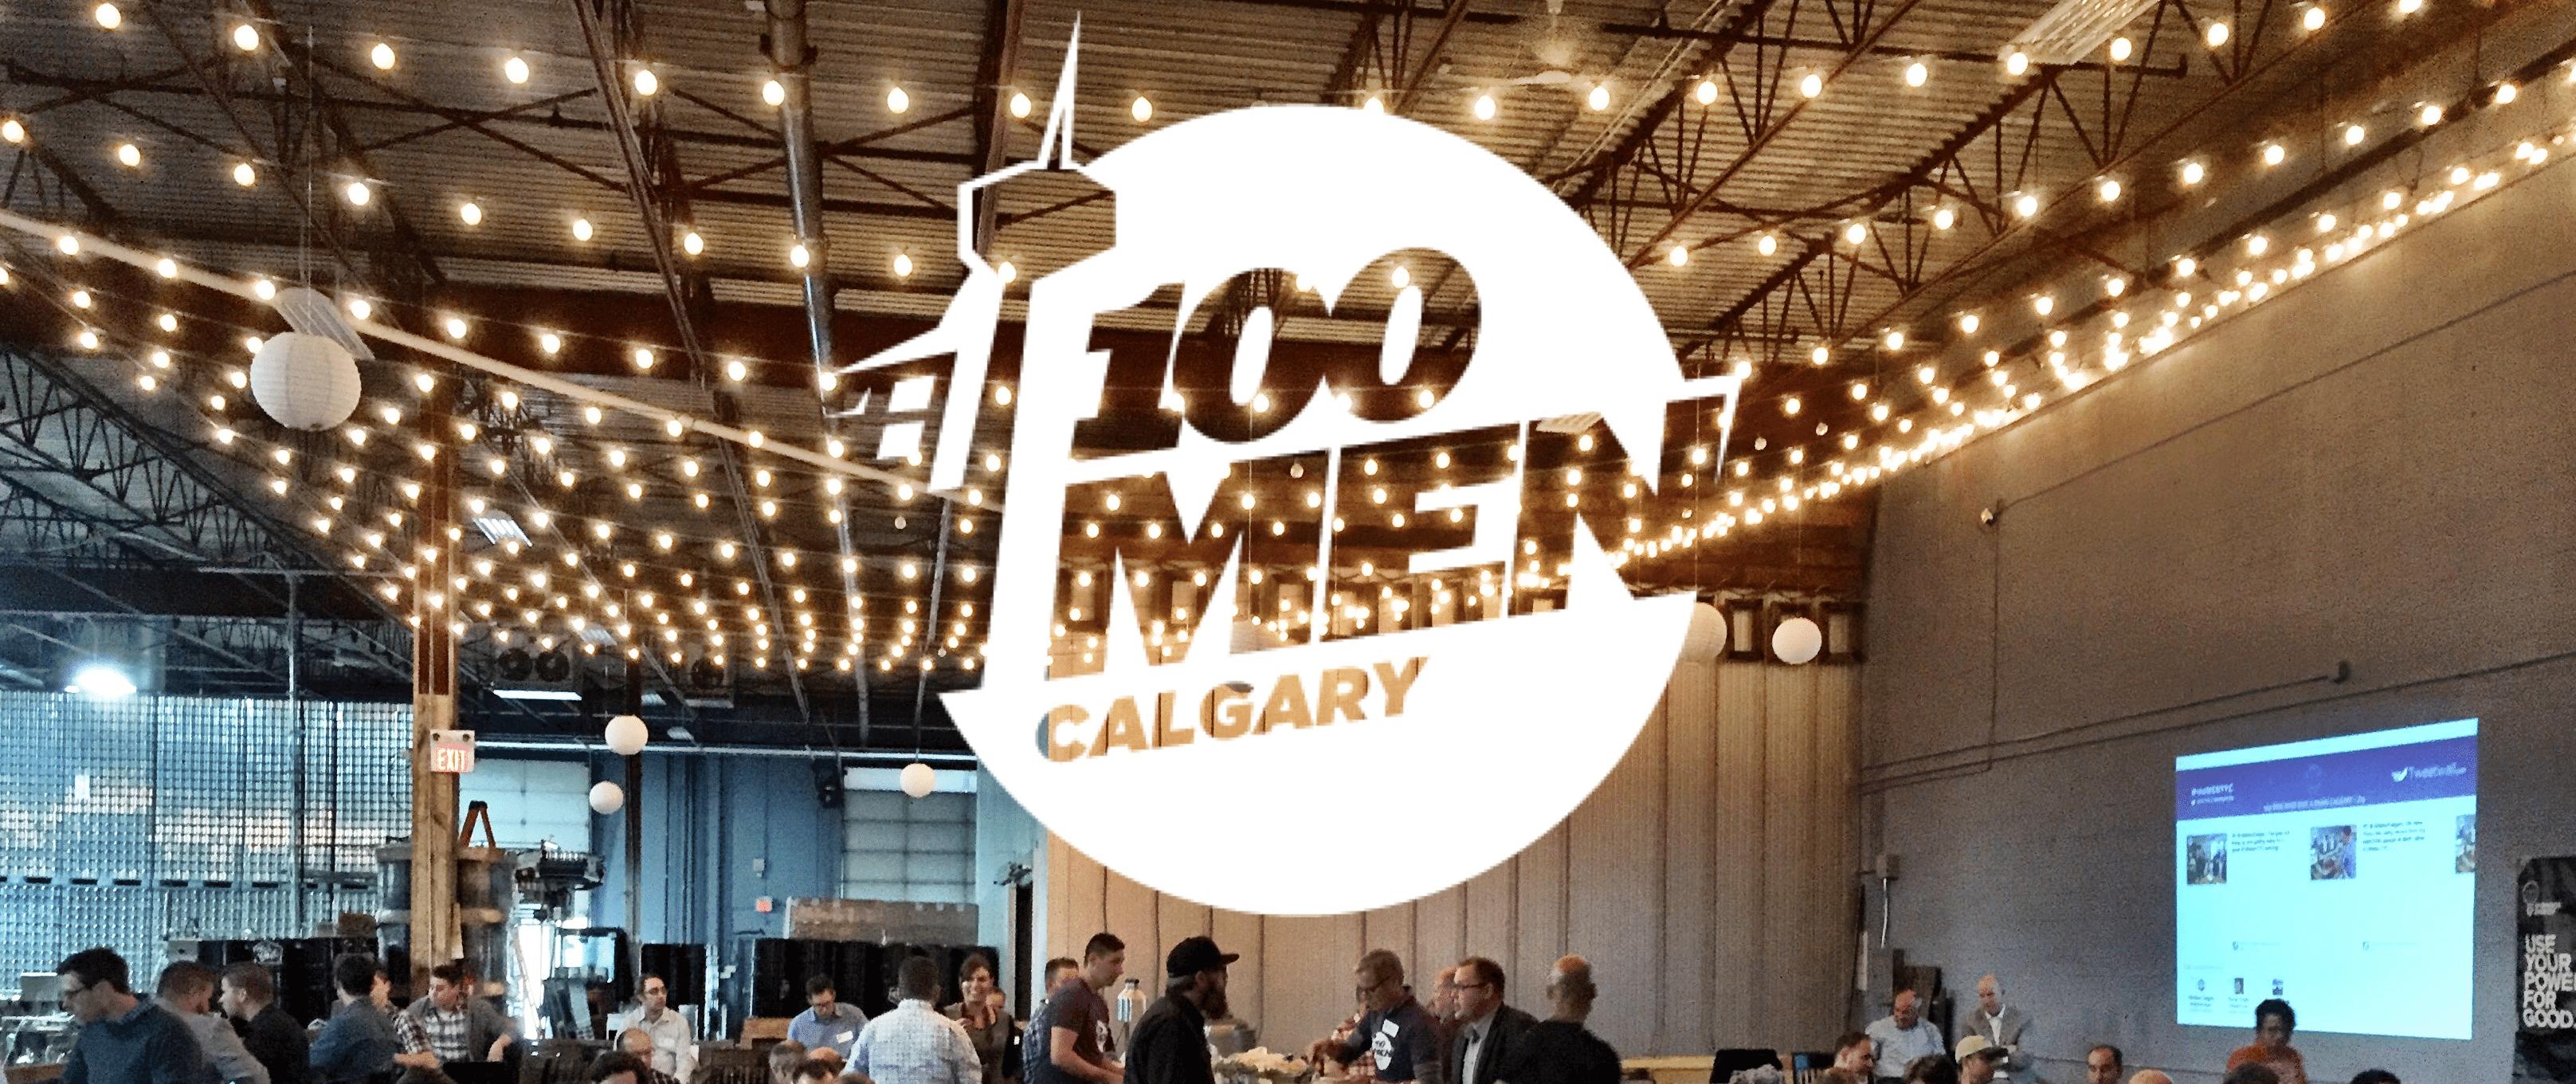 100-men-calgary